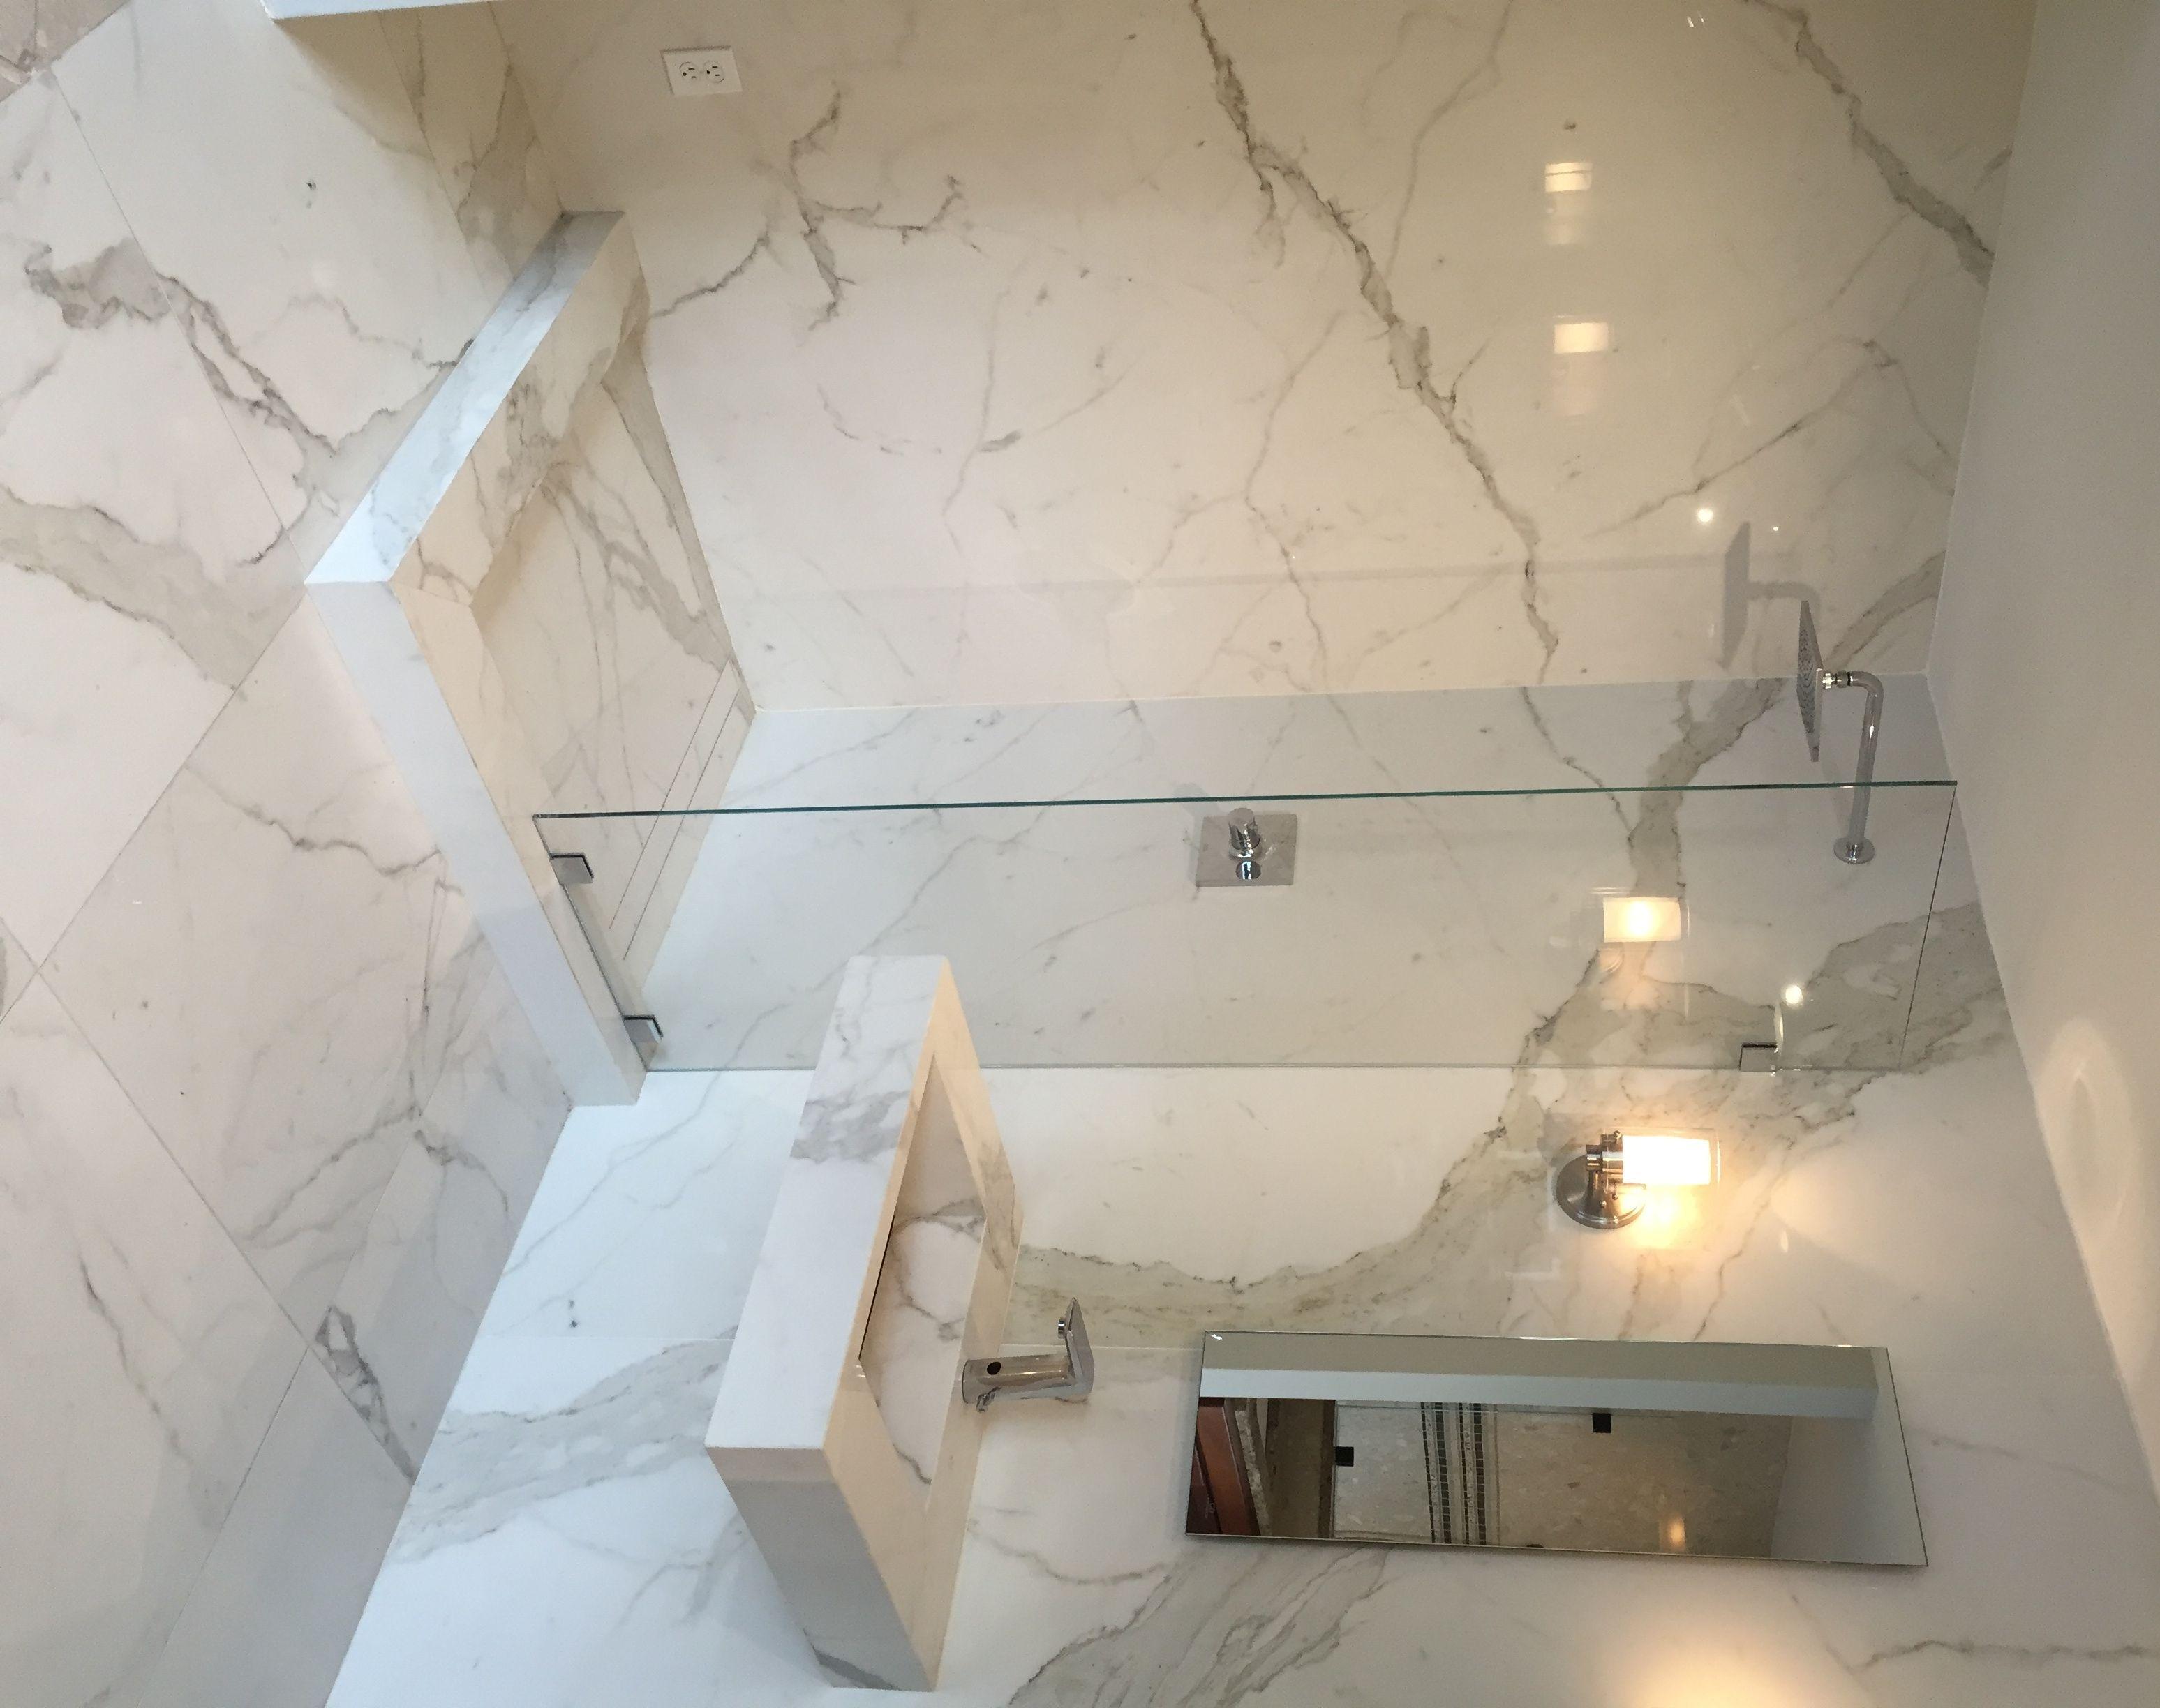 Shower Surfaces - Cintinel.com